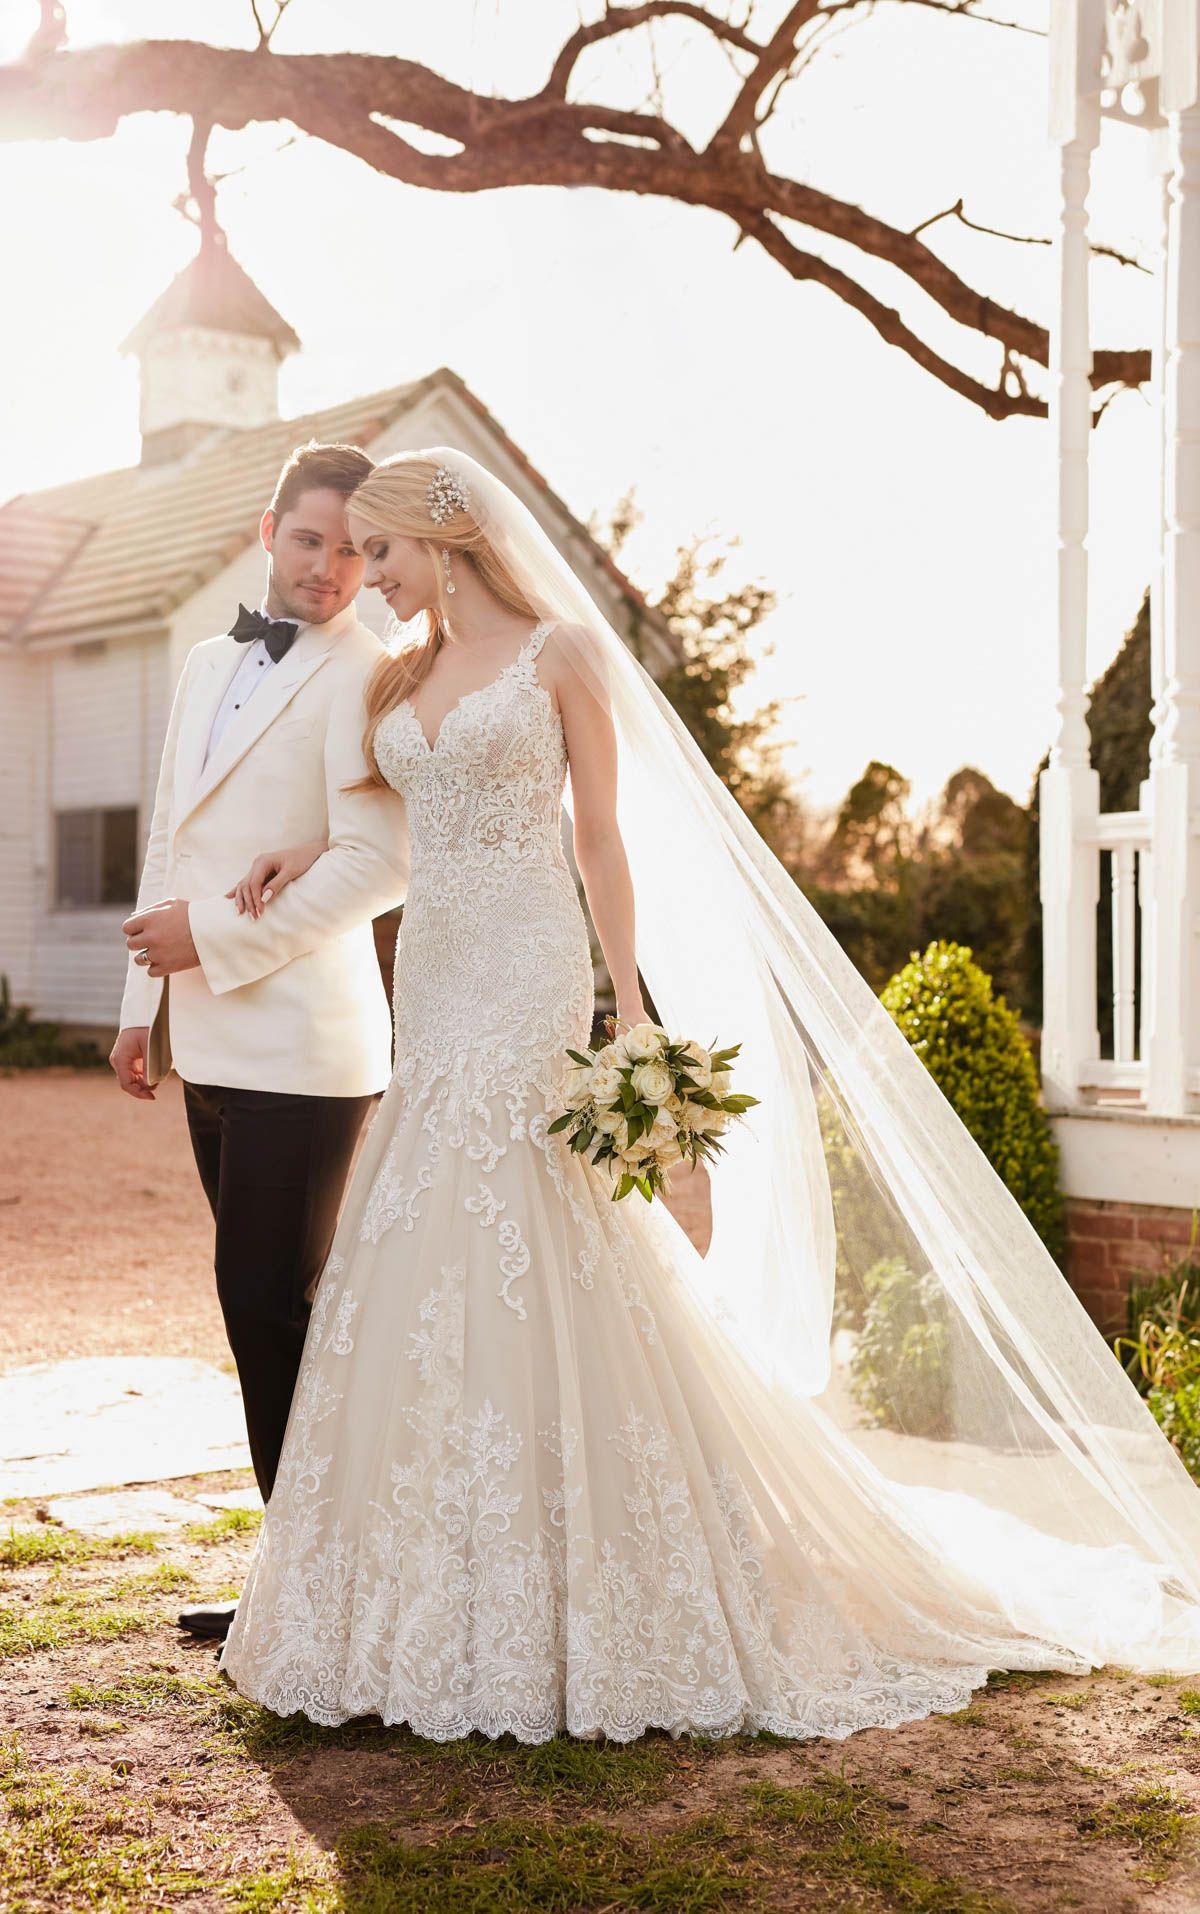 Wedding Dresses | Pinterest | Vintage weddings, Wedding dress and Gowns